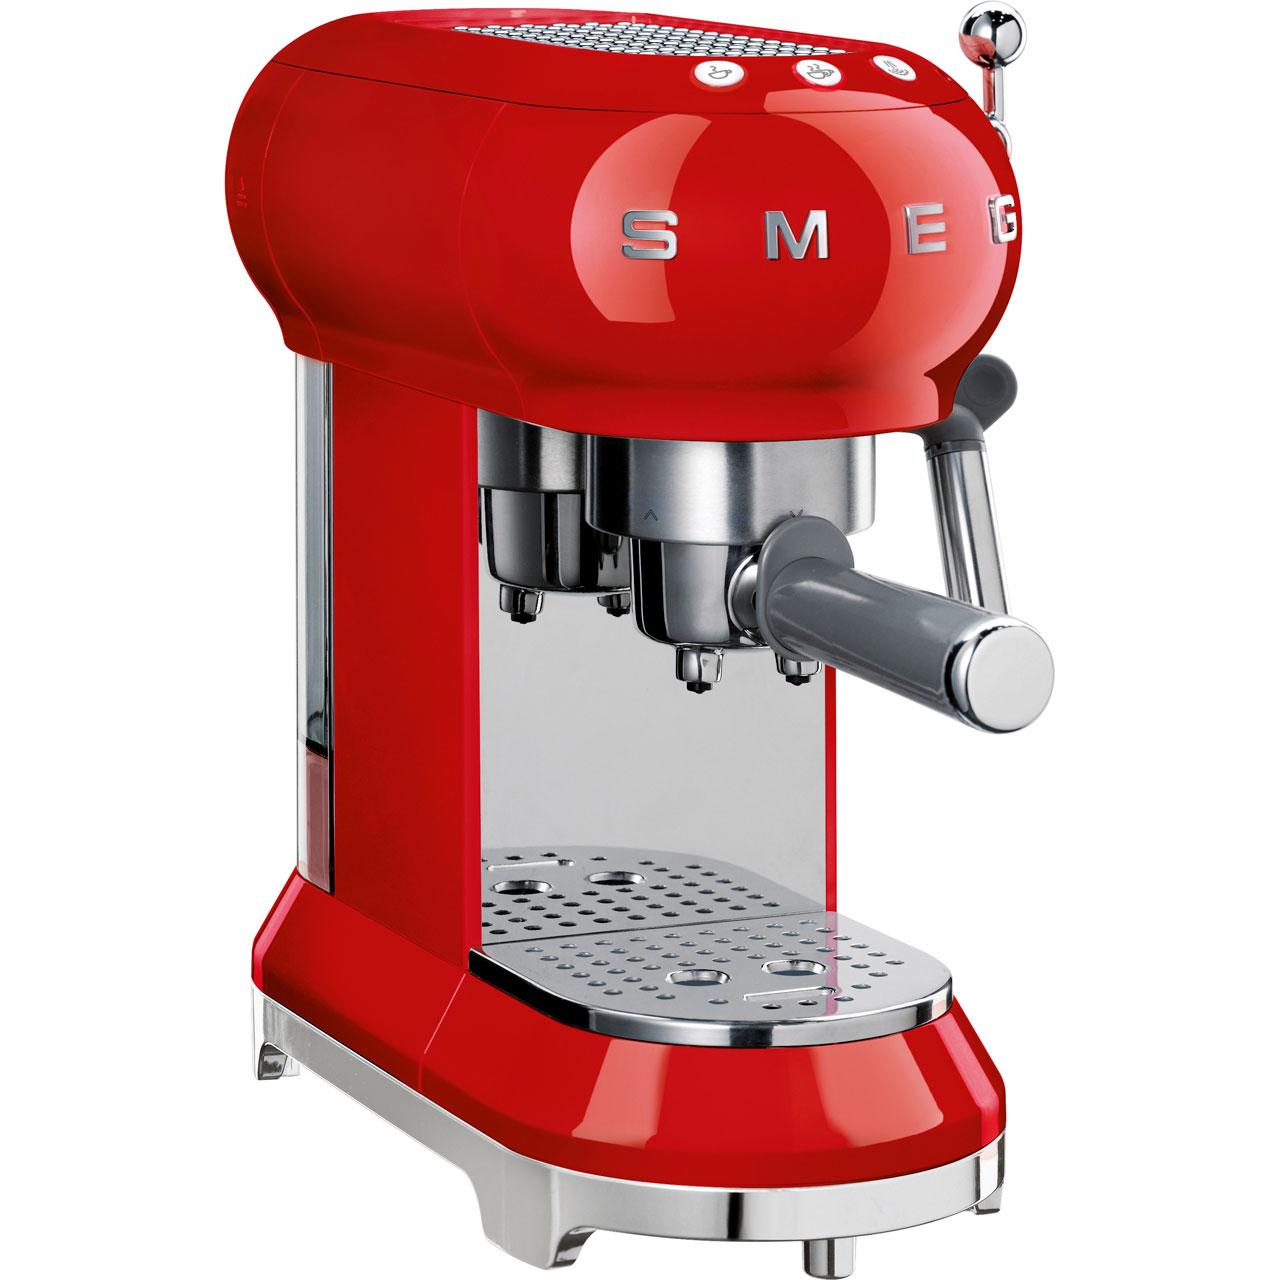 Ecf01rdukrd Smeg Filter Coffee Machine Red Aocom